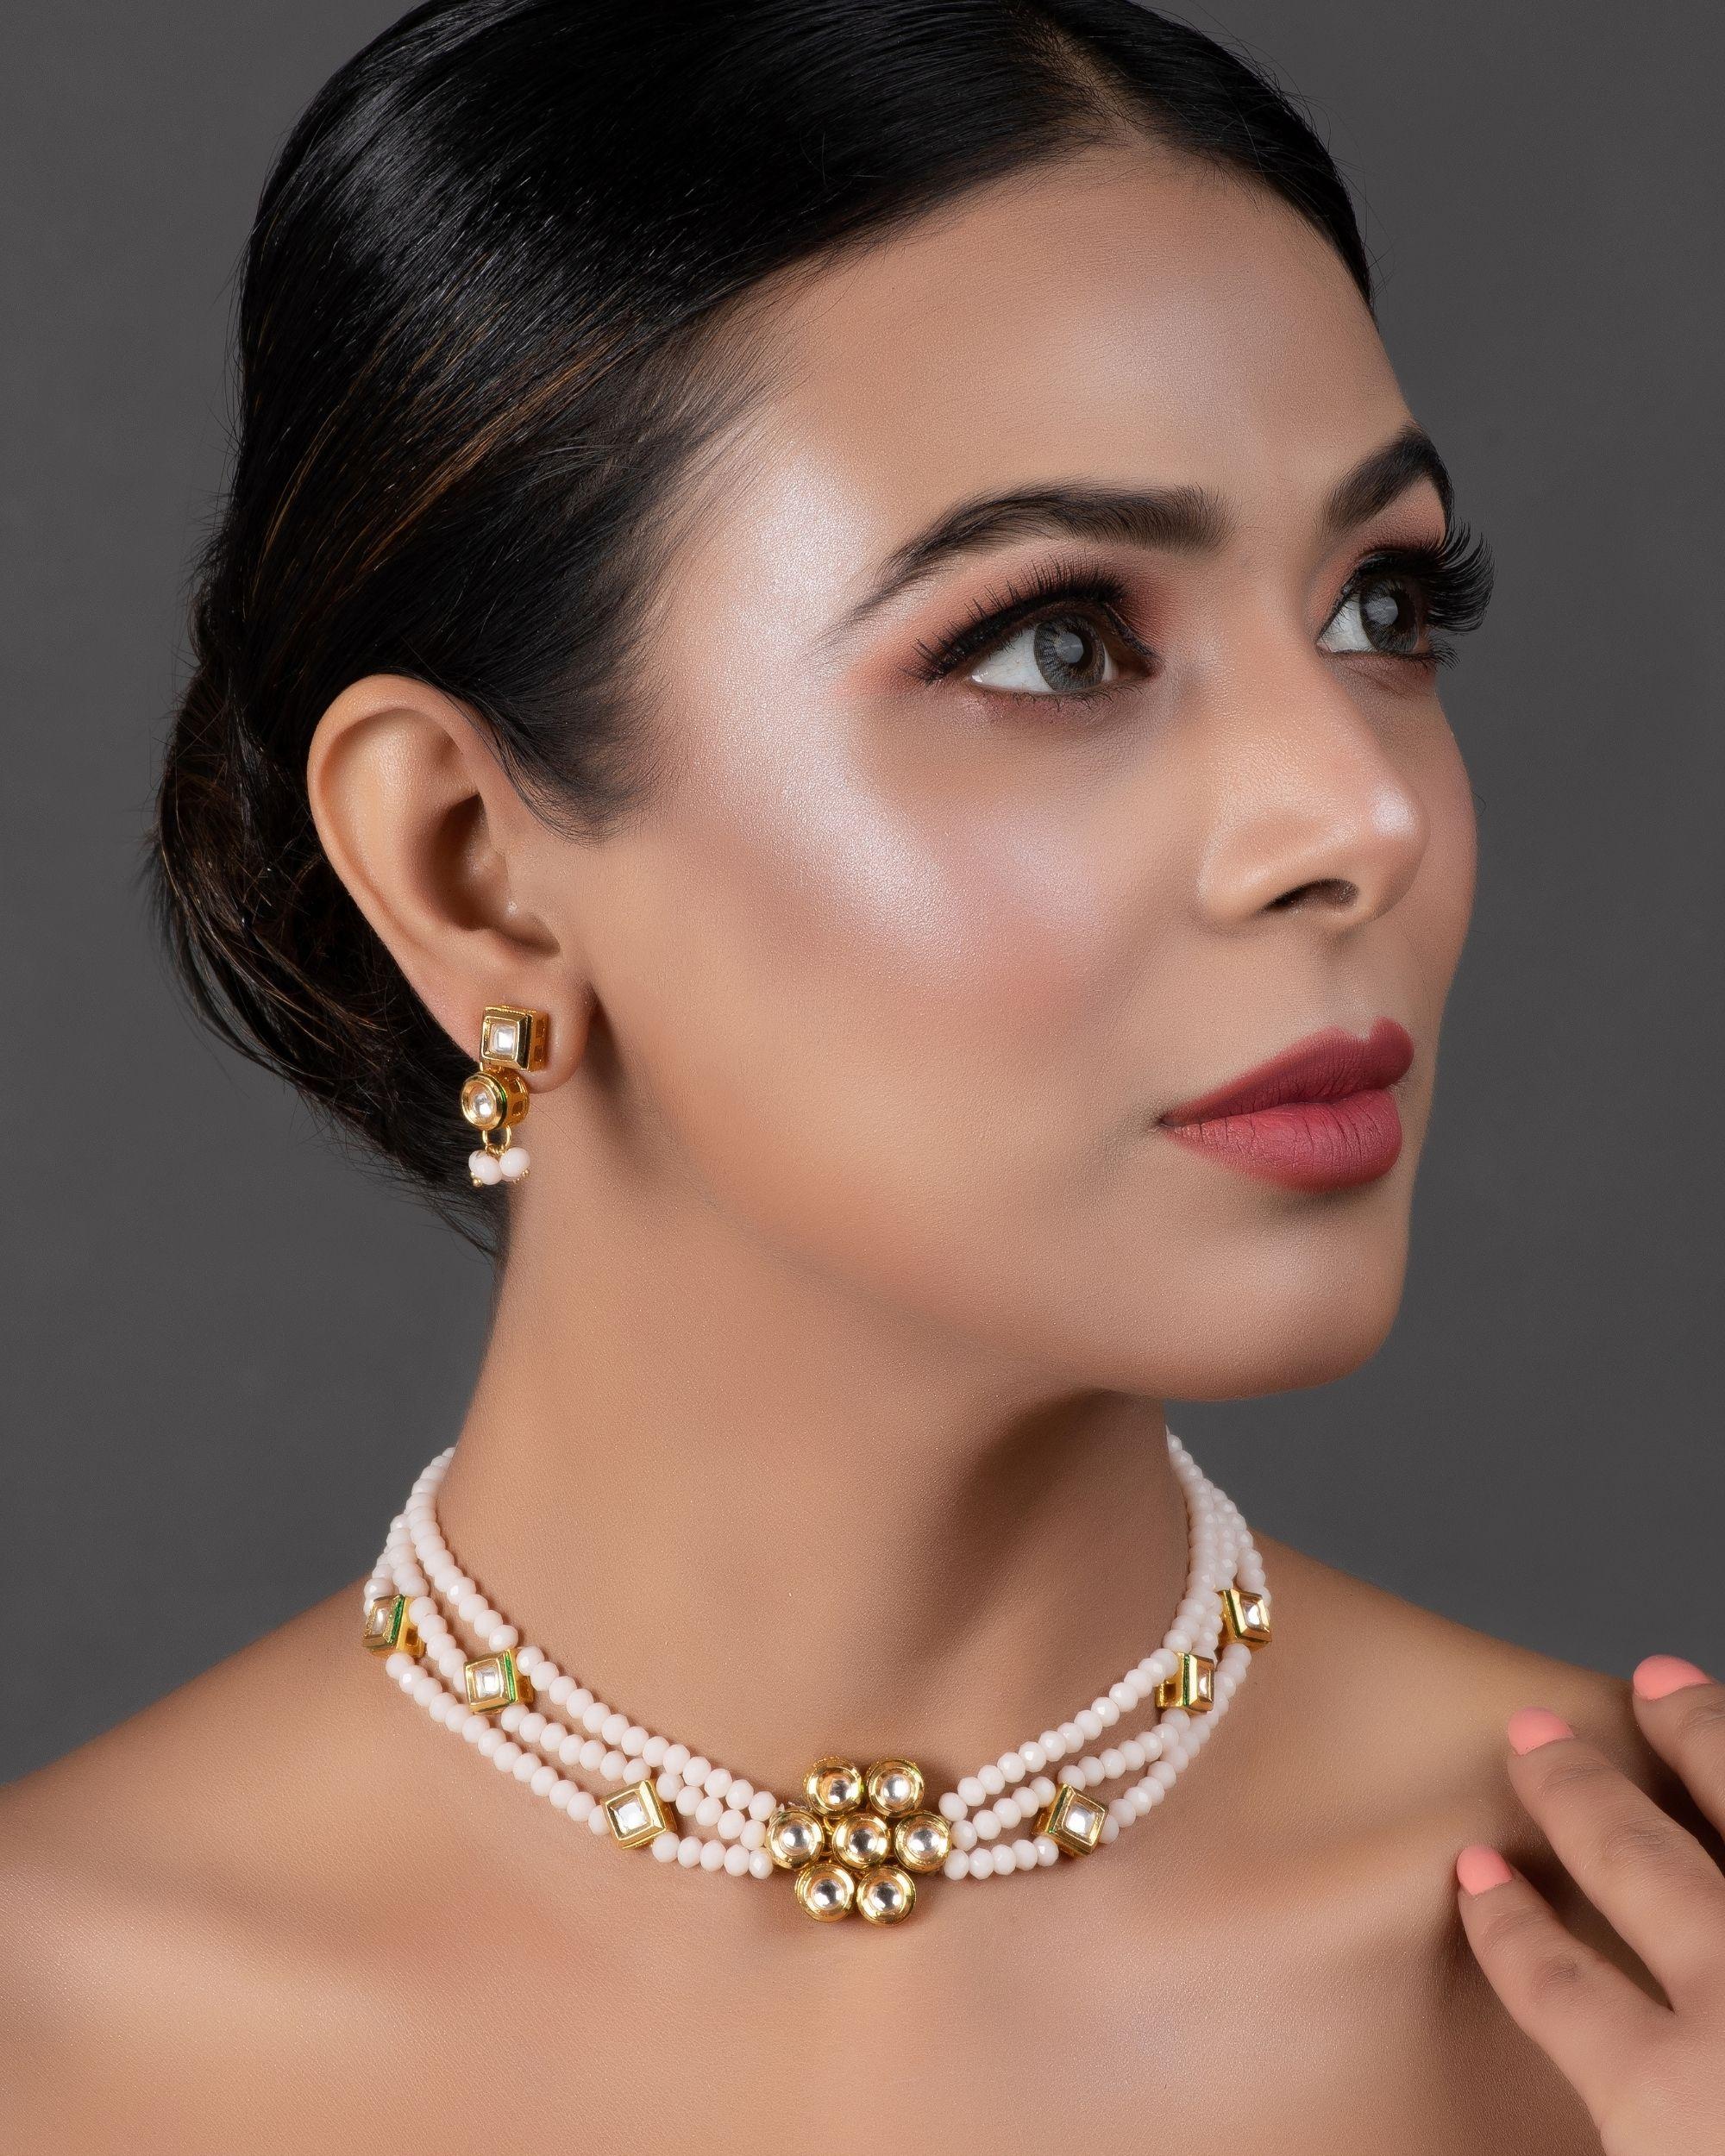 White kundan and onyx choker neckpiece with earrings - set of two